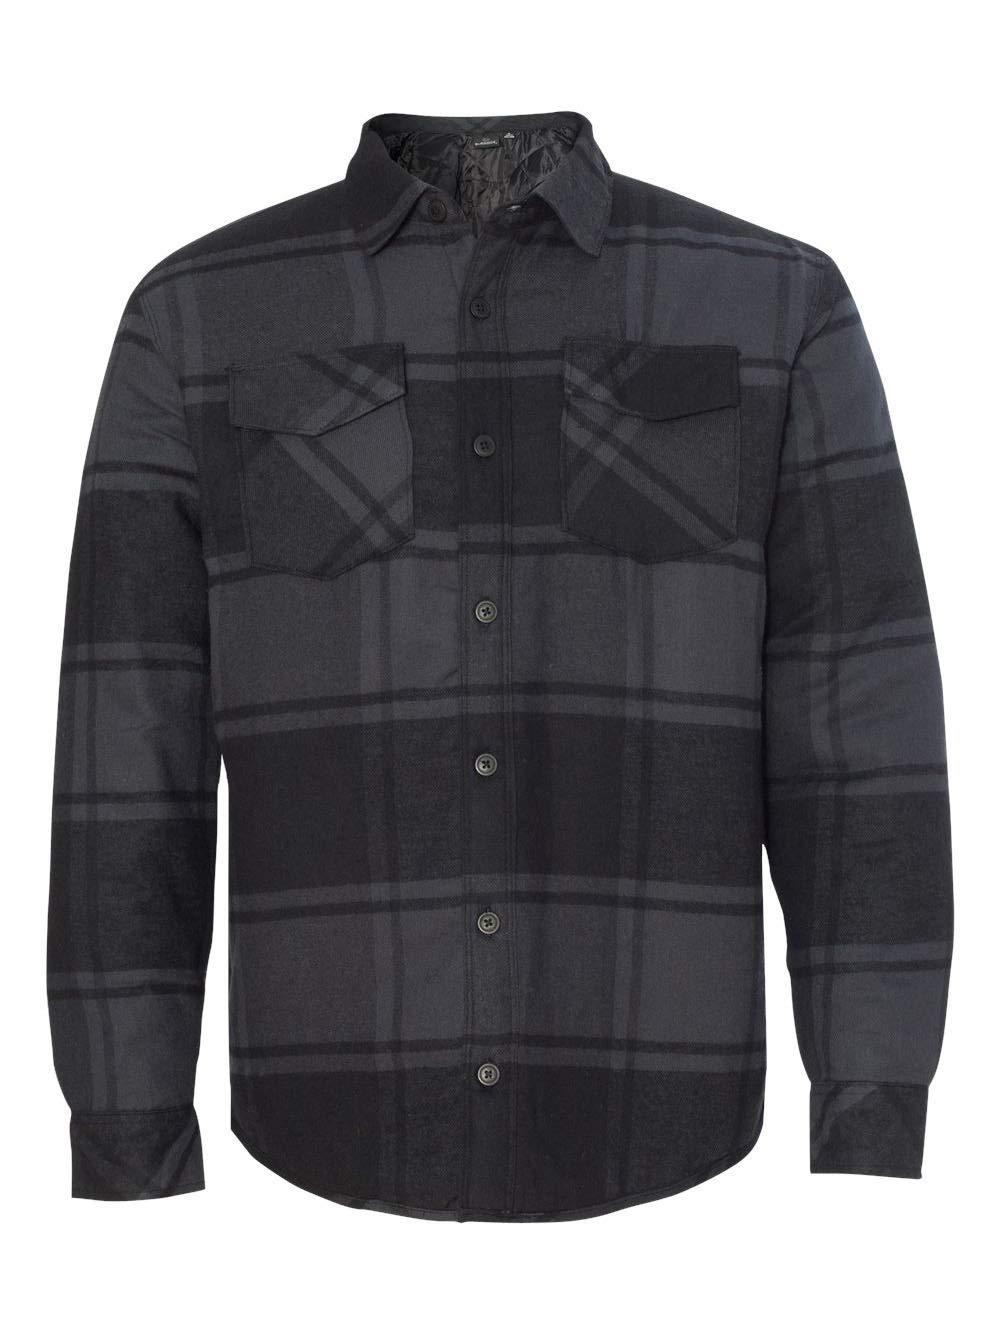 Burnside - Quilted Flannel Jacket - B8610